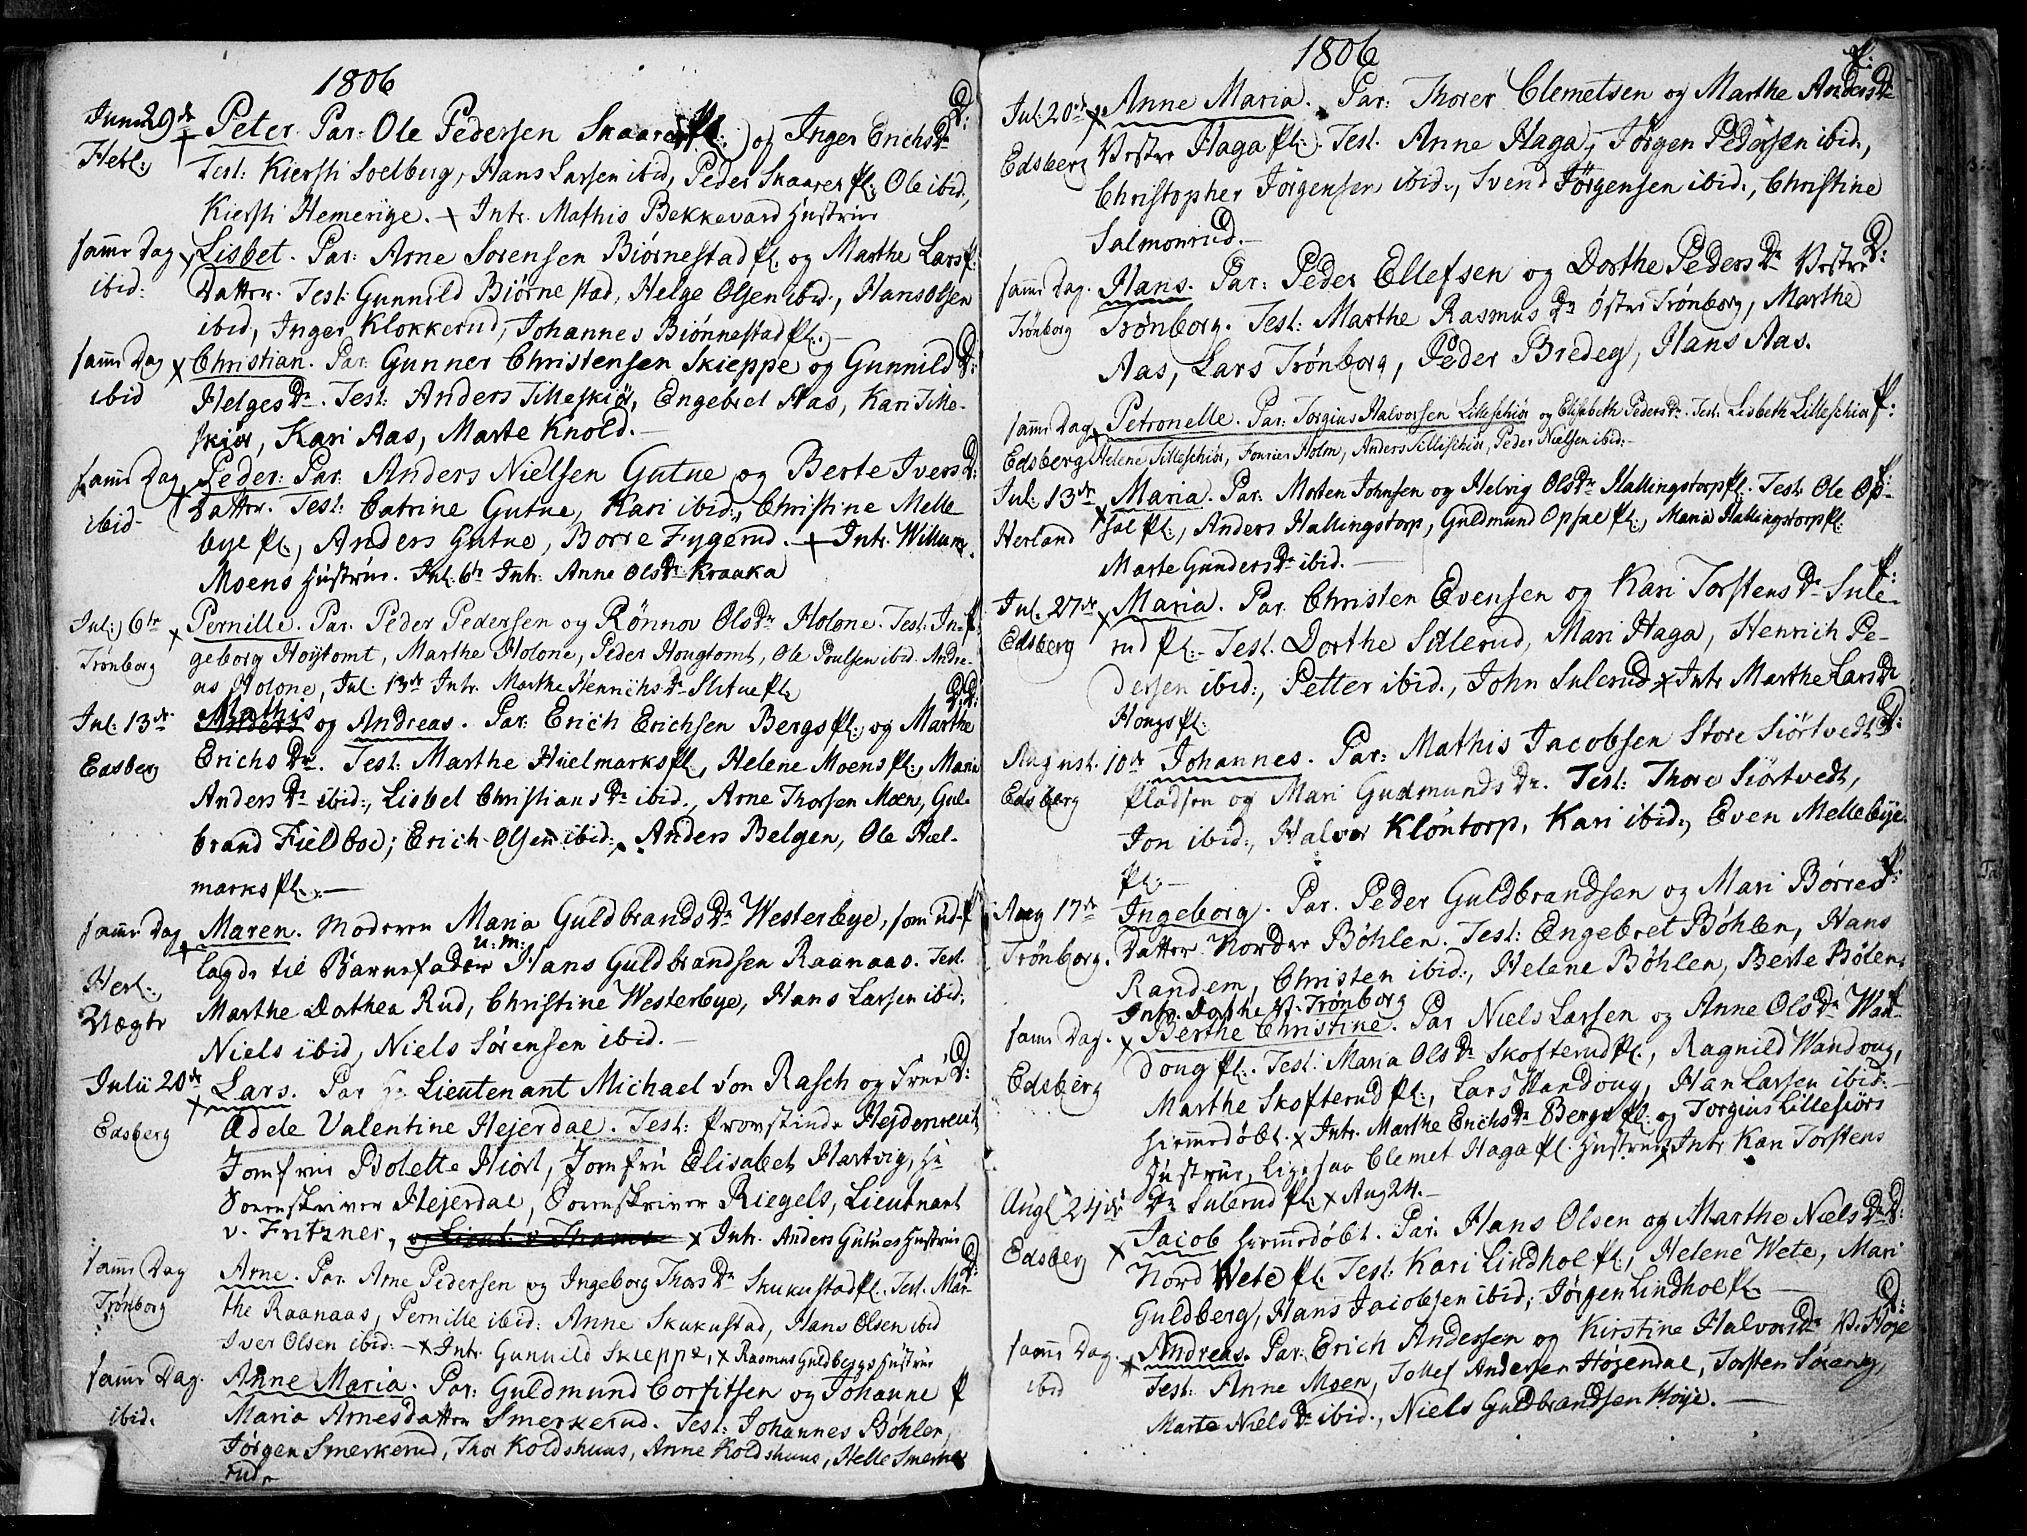 SAO, Eidsberg prestekontor Kirkebøker, F/Fa/L0005: Ministerialbok nr. I 5, 1786-1807, s. 92